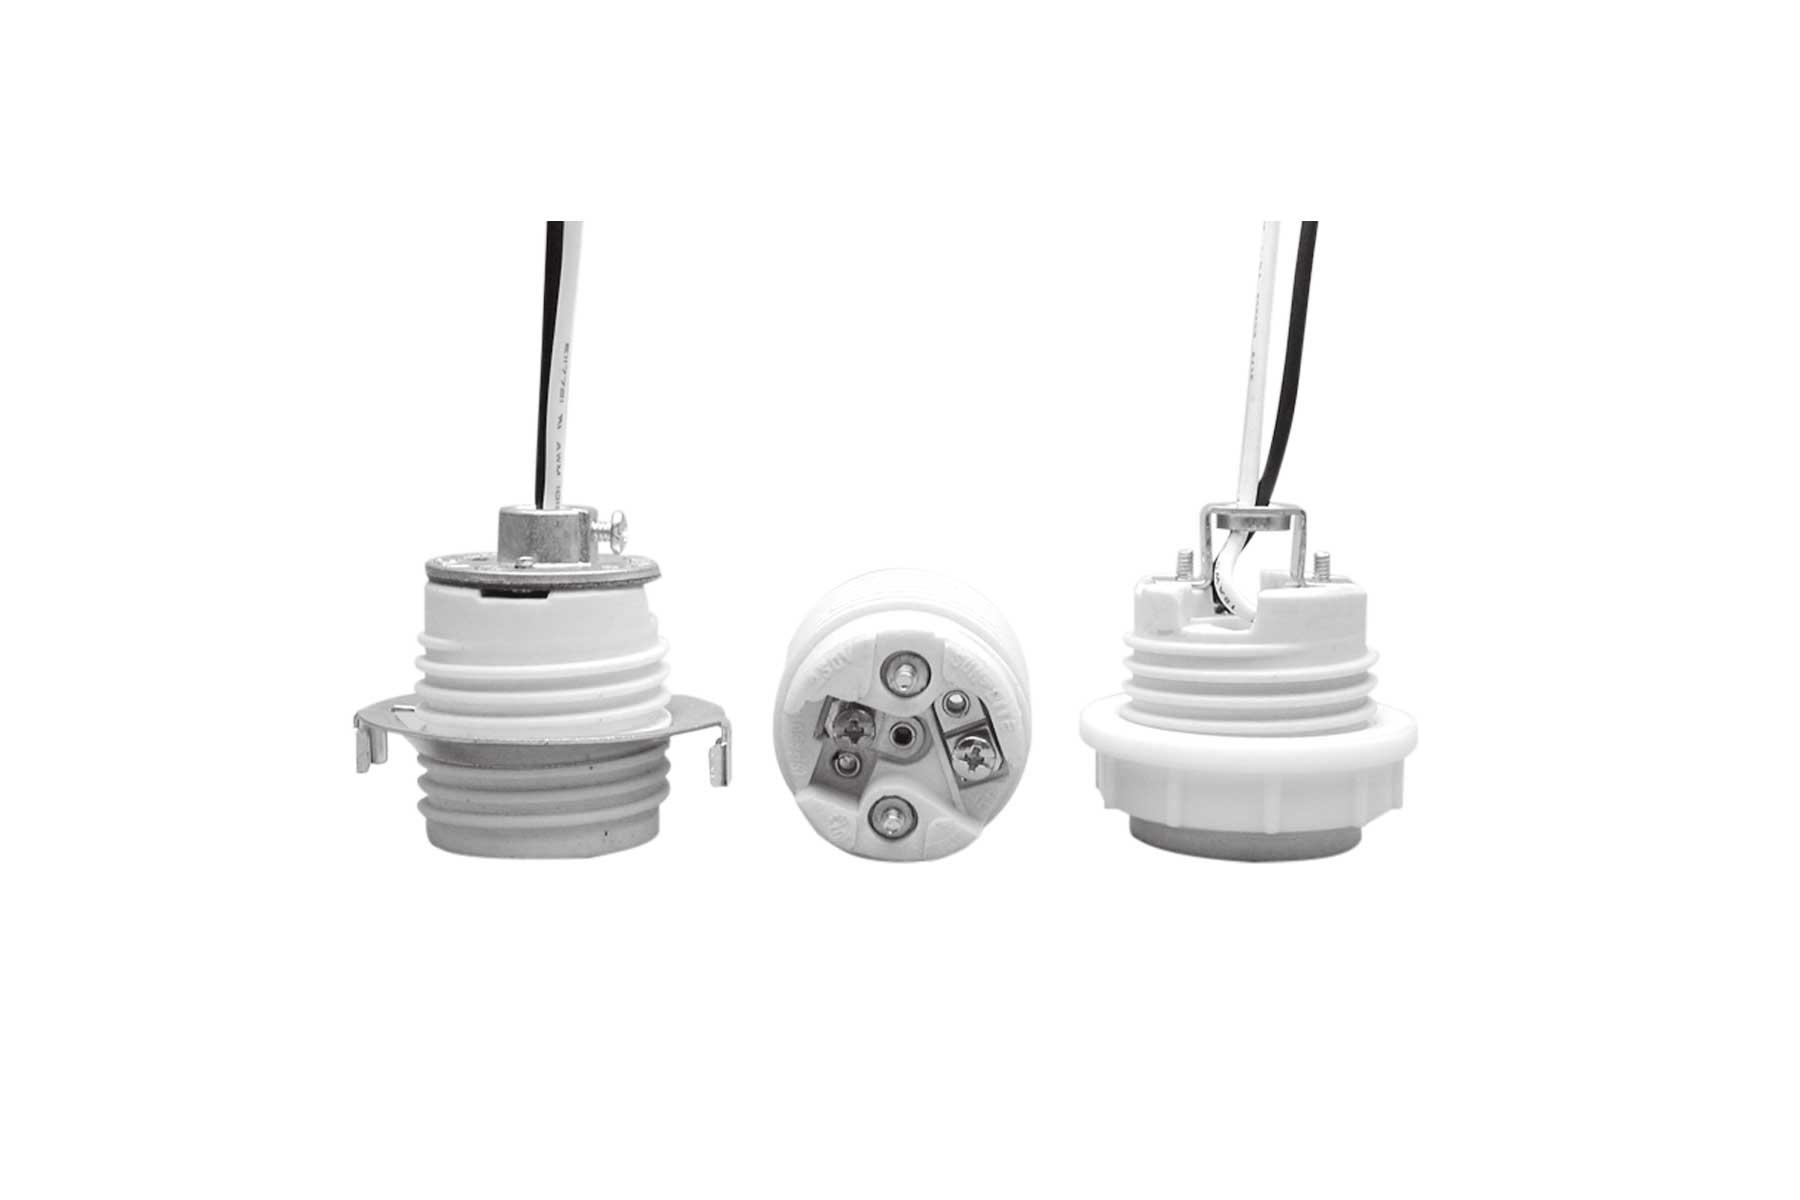 Medium Base Outer Threaded Porcelain Incandescent Light Socket